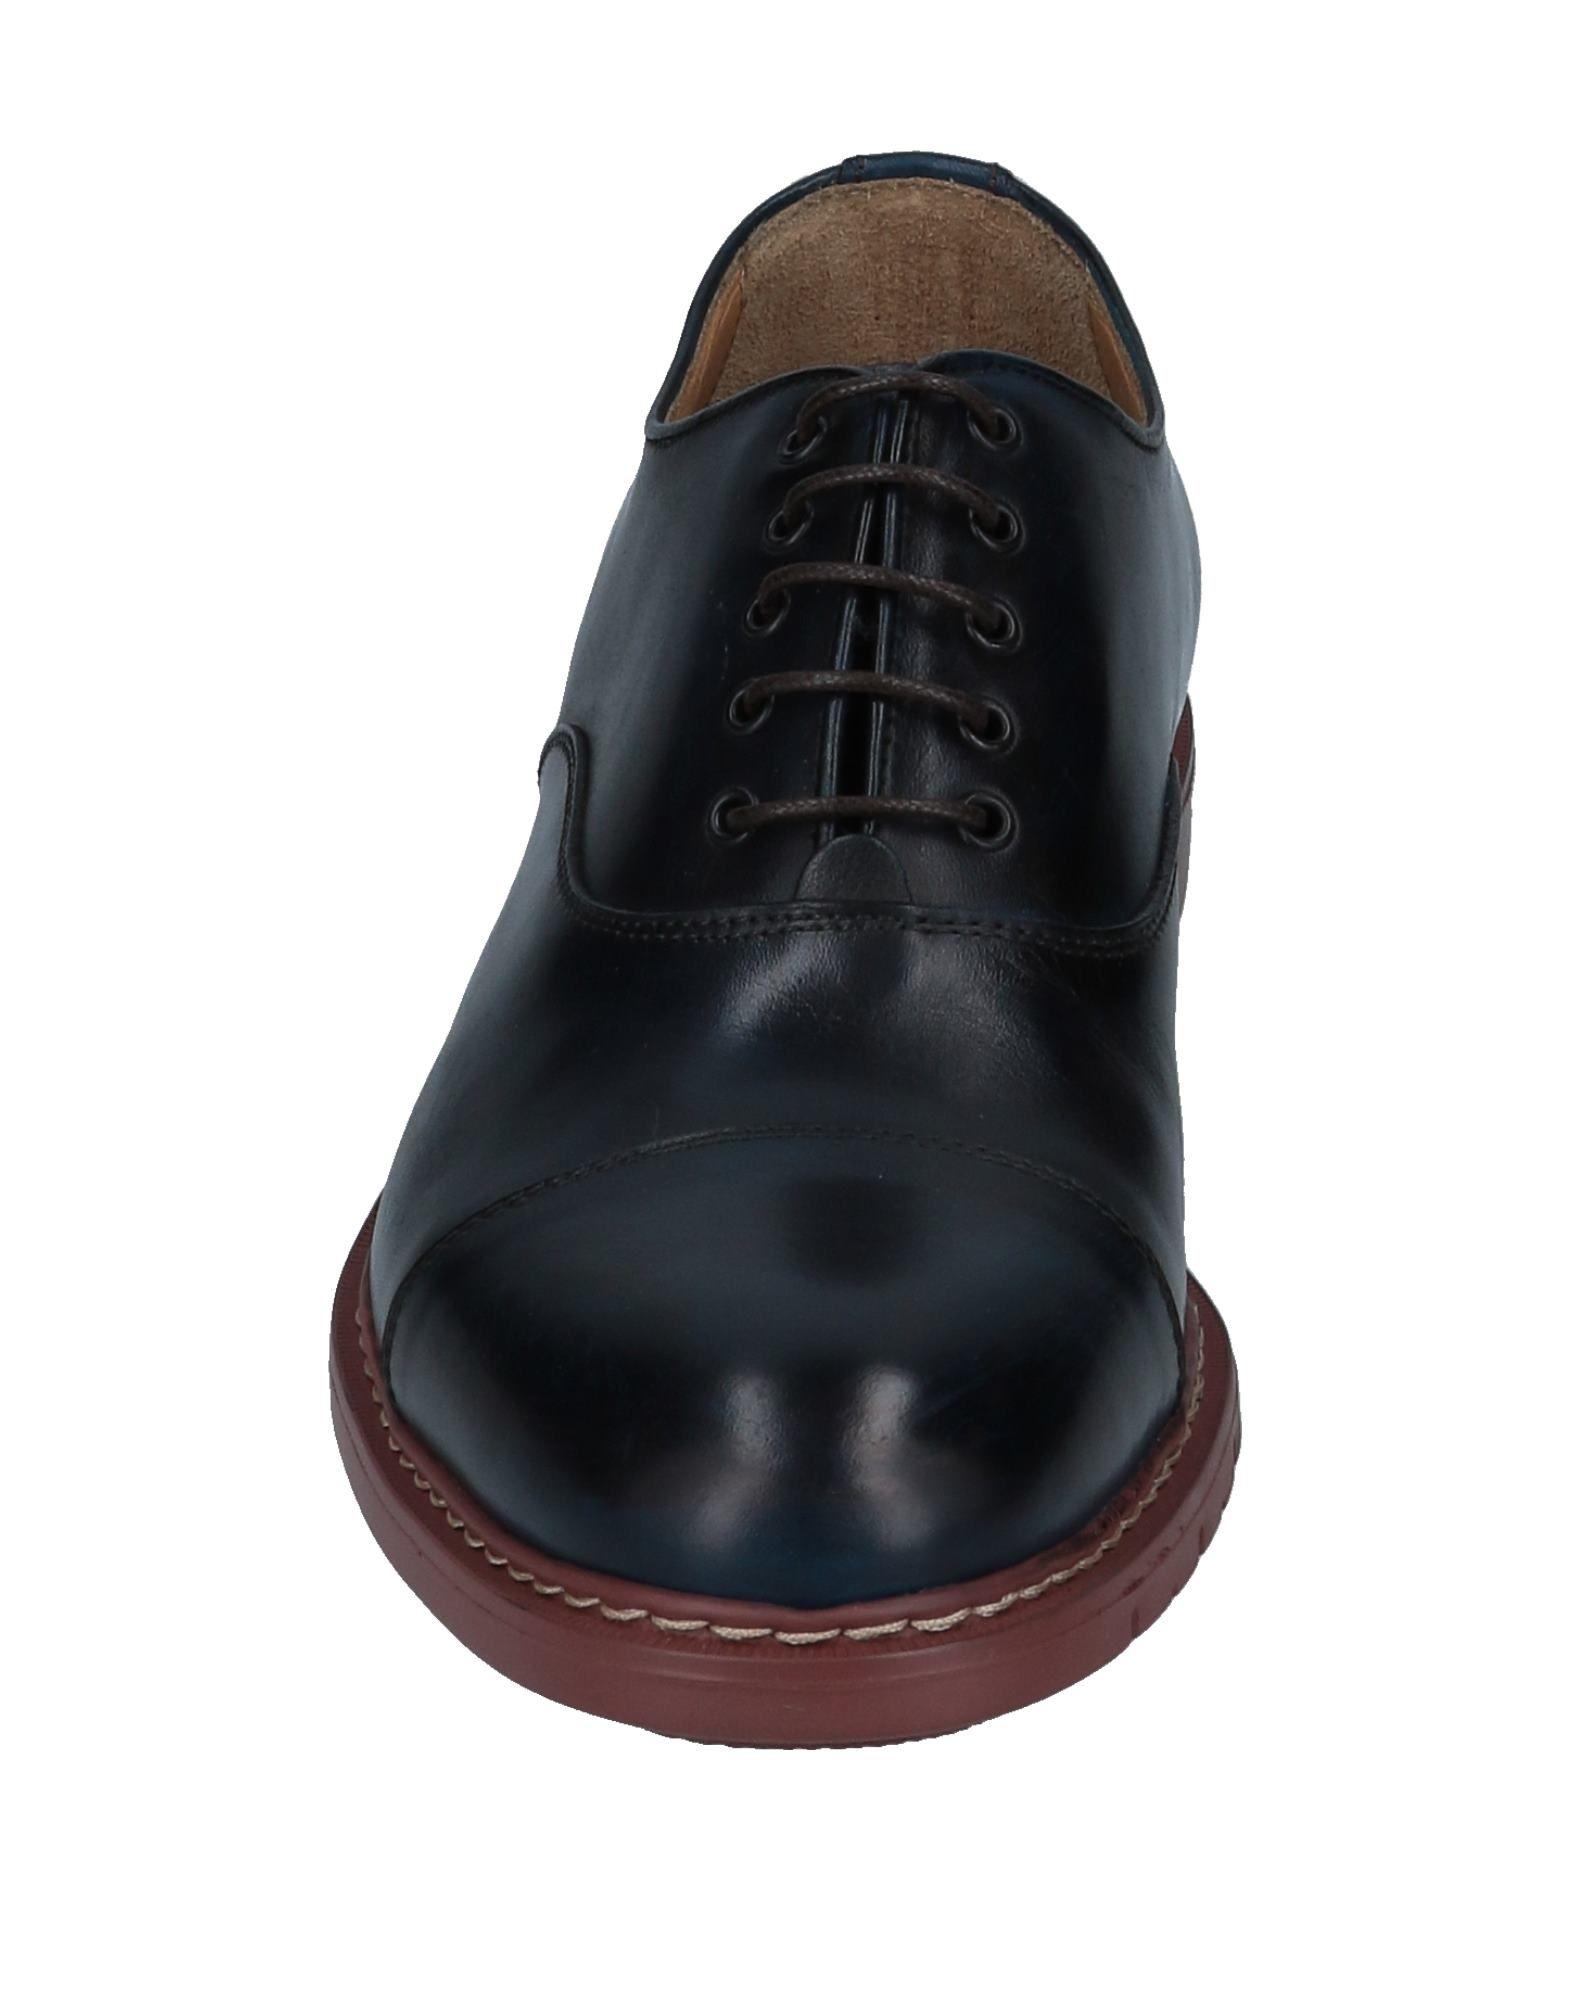 Baldinini Schnürschuhe Qualität Herren  11554242BO Gute Qualität Schnürschuhe beliebte Schuhe 9a82bd